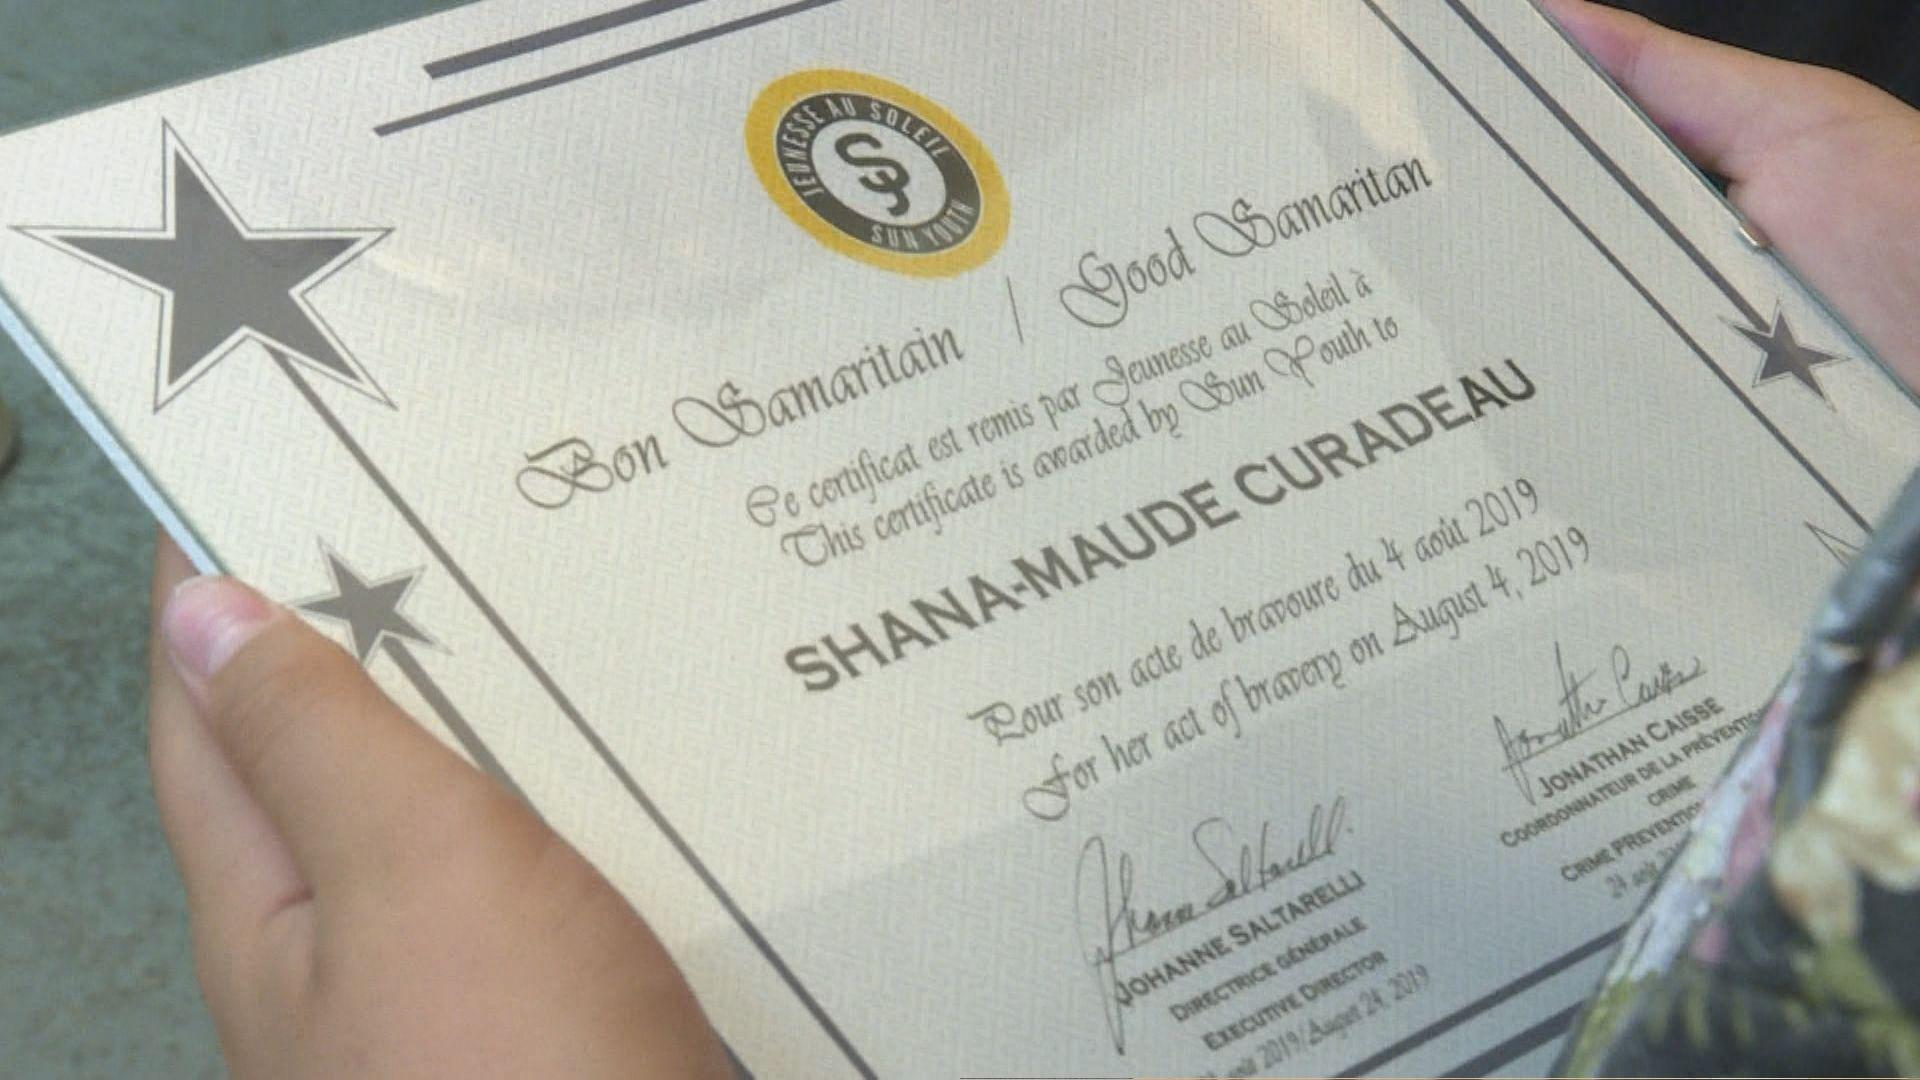 Two 11-year-old girls honoured with Good Samaritan award for saving drowning boy